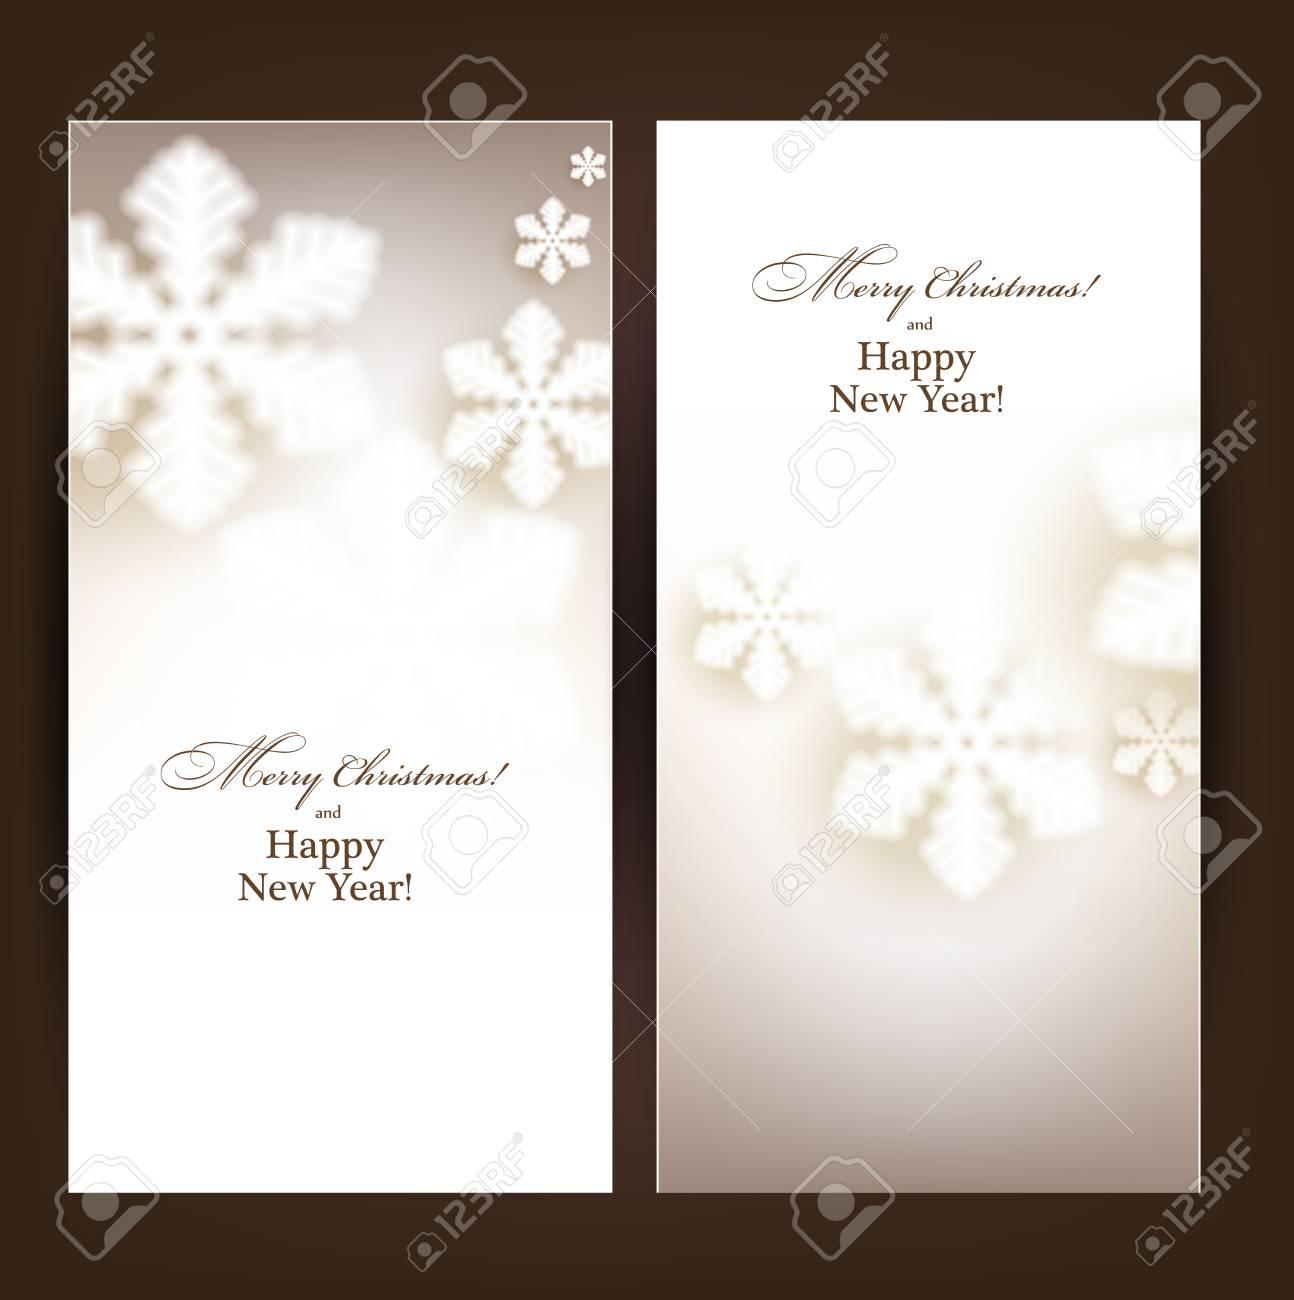 Winter banners. Fallen defocused snowflakes. Christmas. Vector. Stock Vector - 22497808